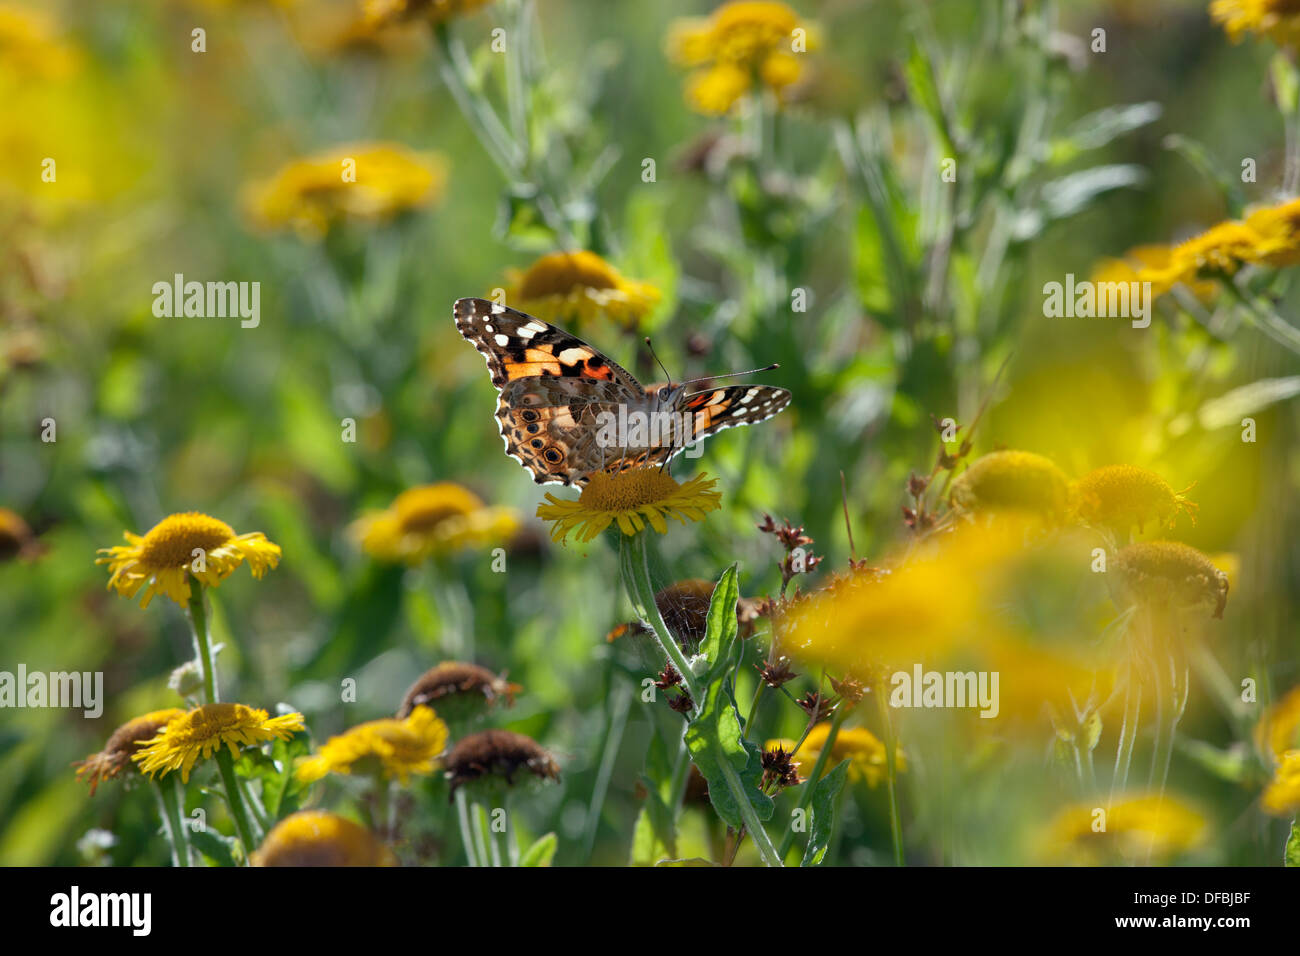 Painted Lady Butterfly Cynthia cardui feeding on Fleabane - Stock Image